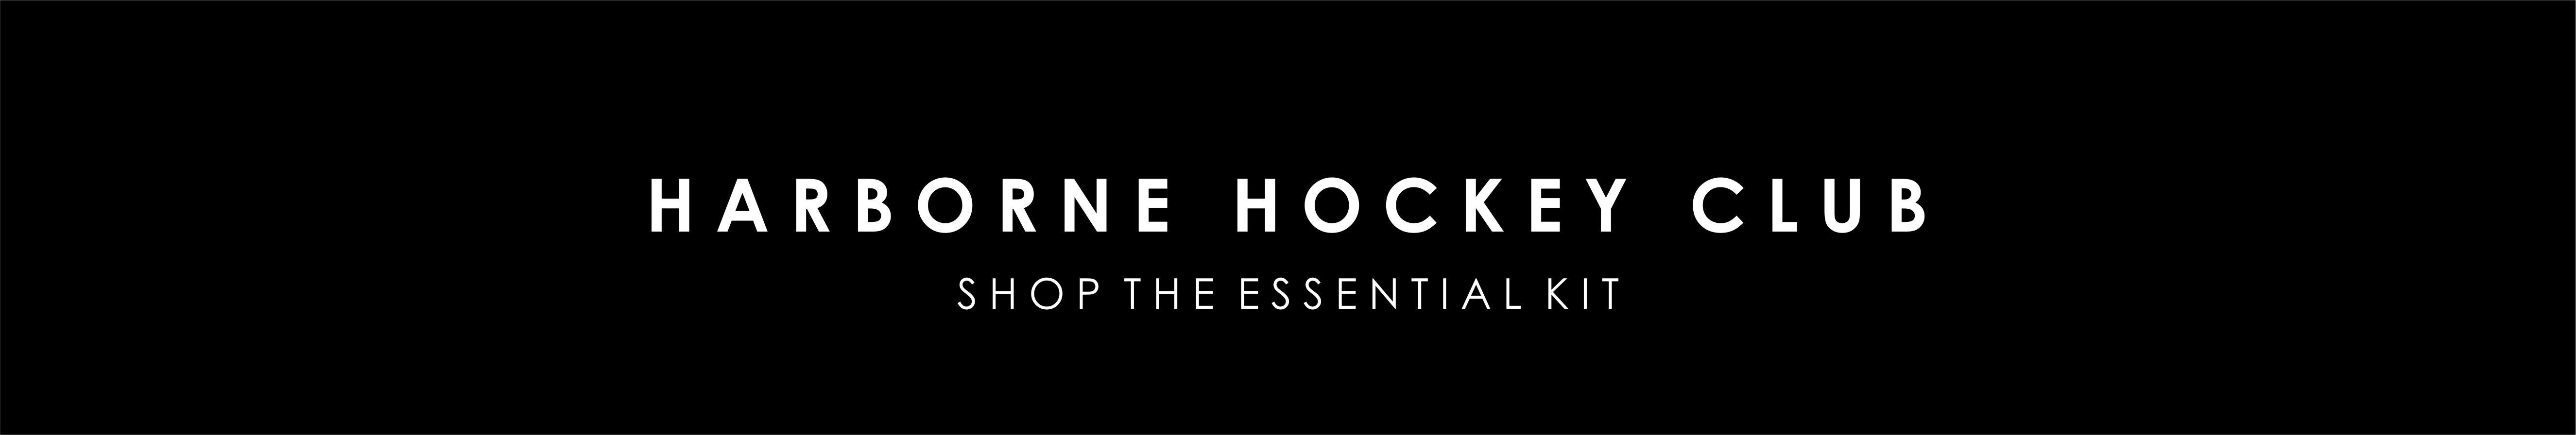 harborne-hockey-club-banner-new.jpg